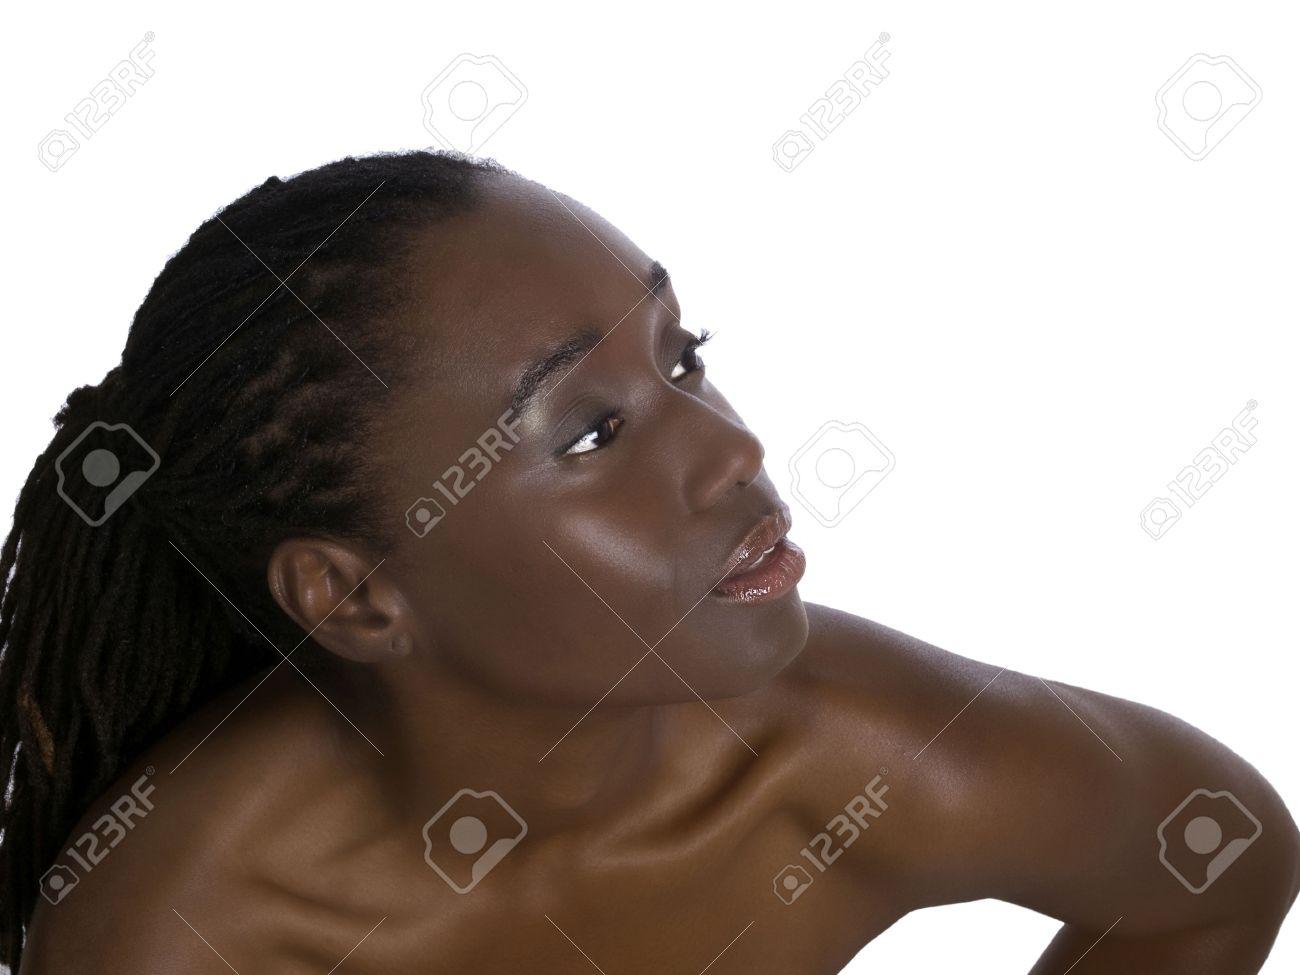 femme africaine nue